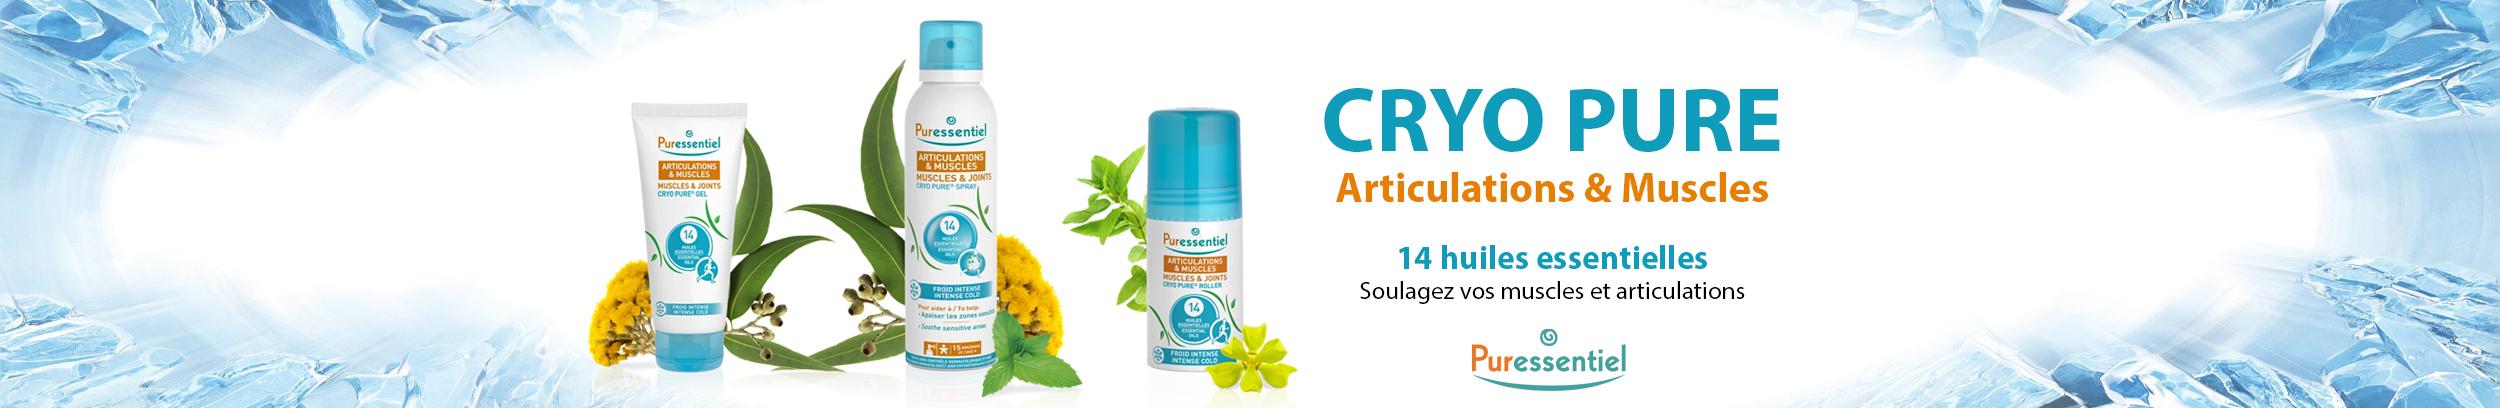 Puressentiel Cryo Pure